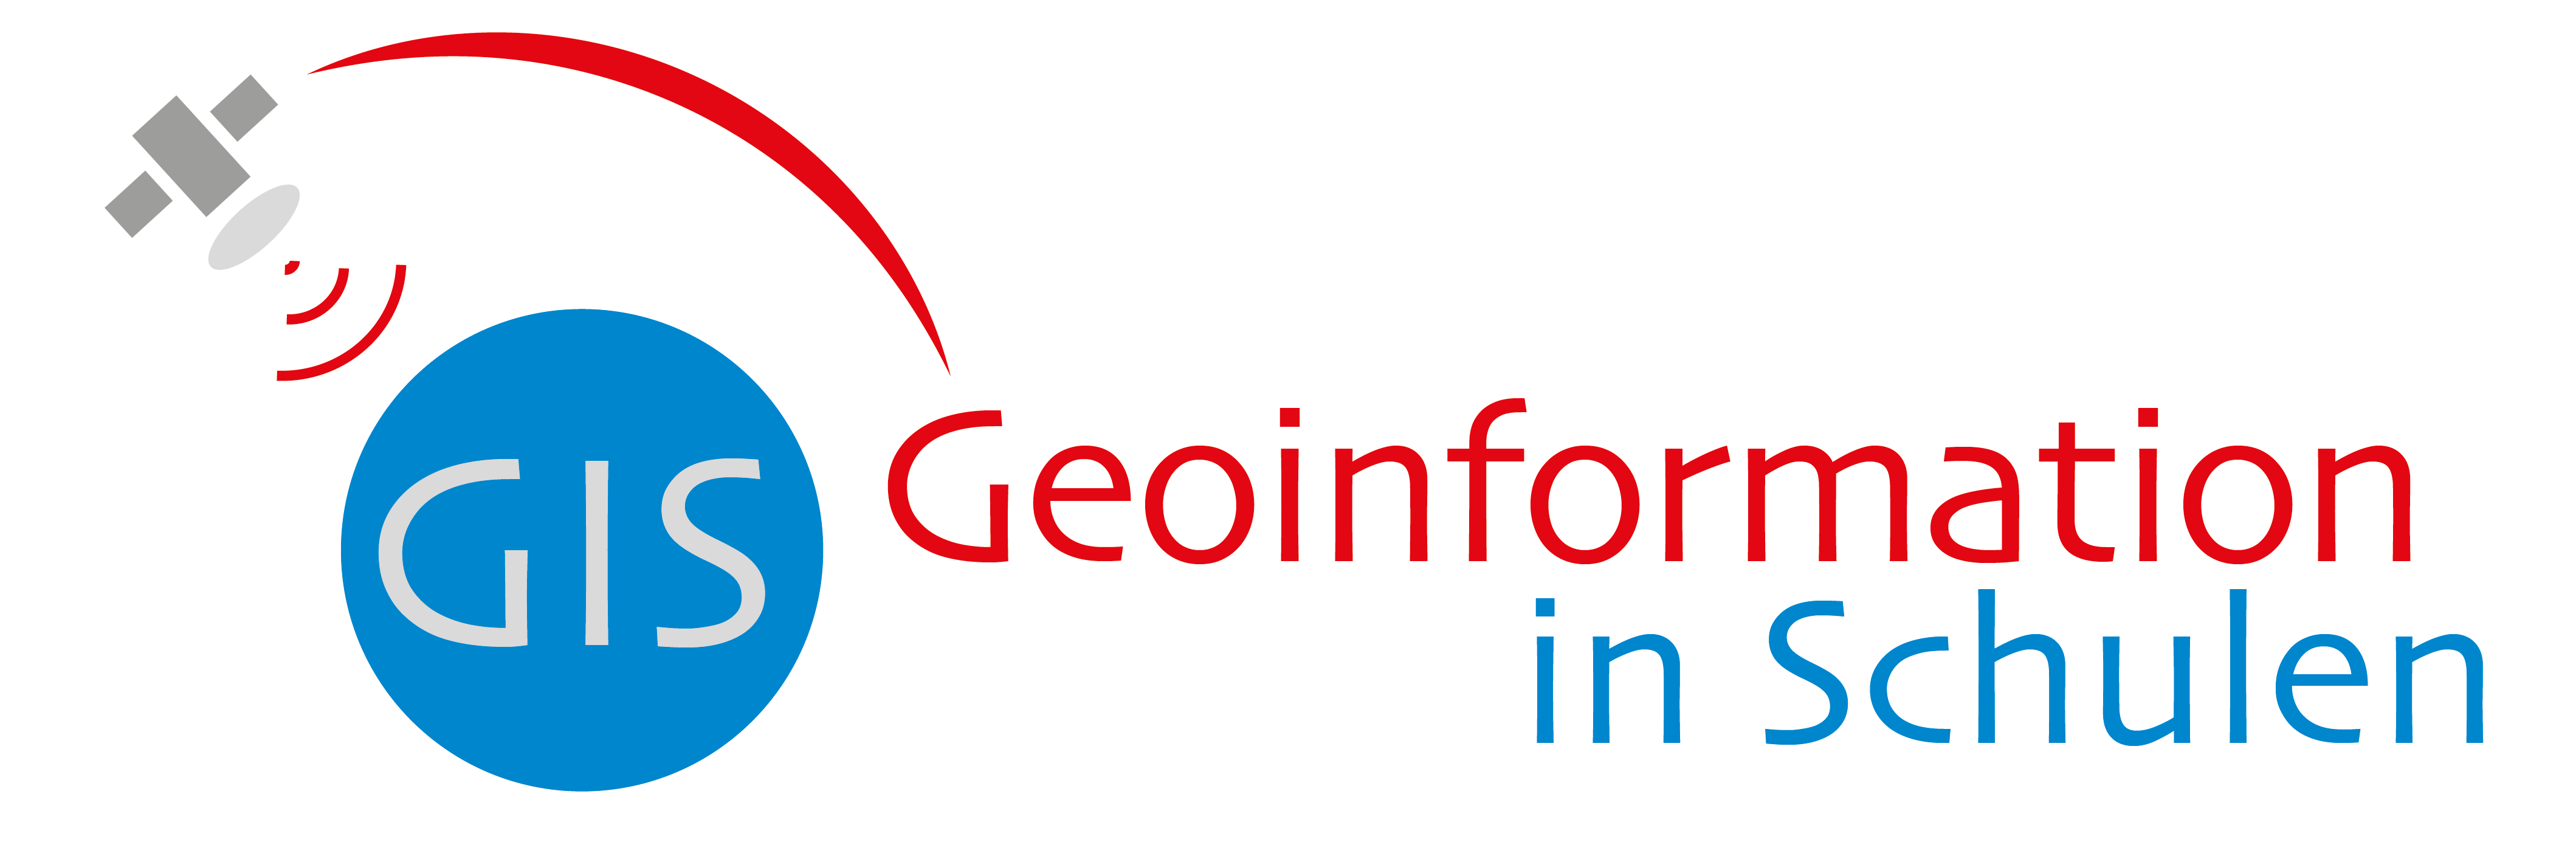 Geoinformation in Schulen